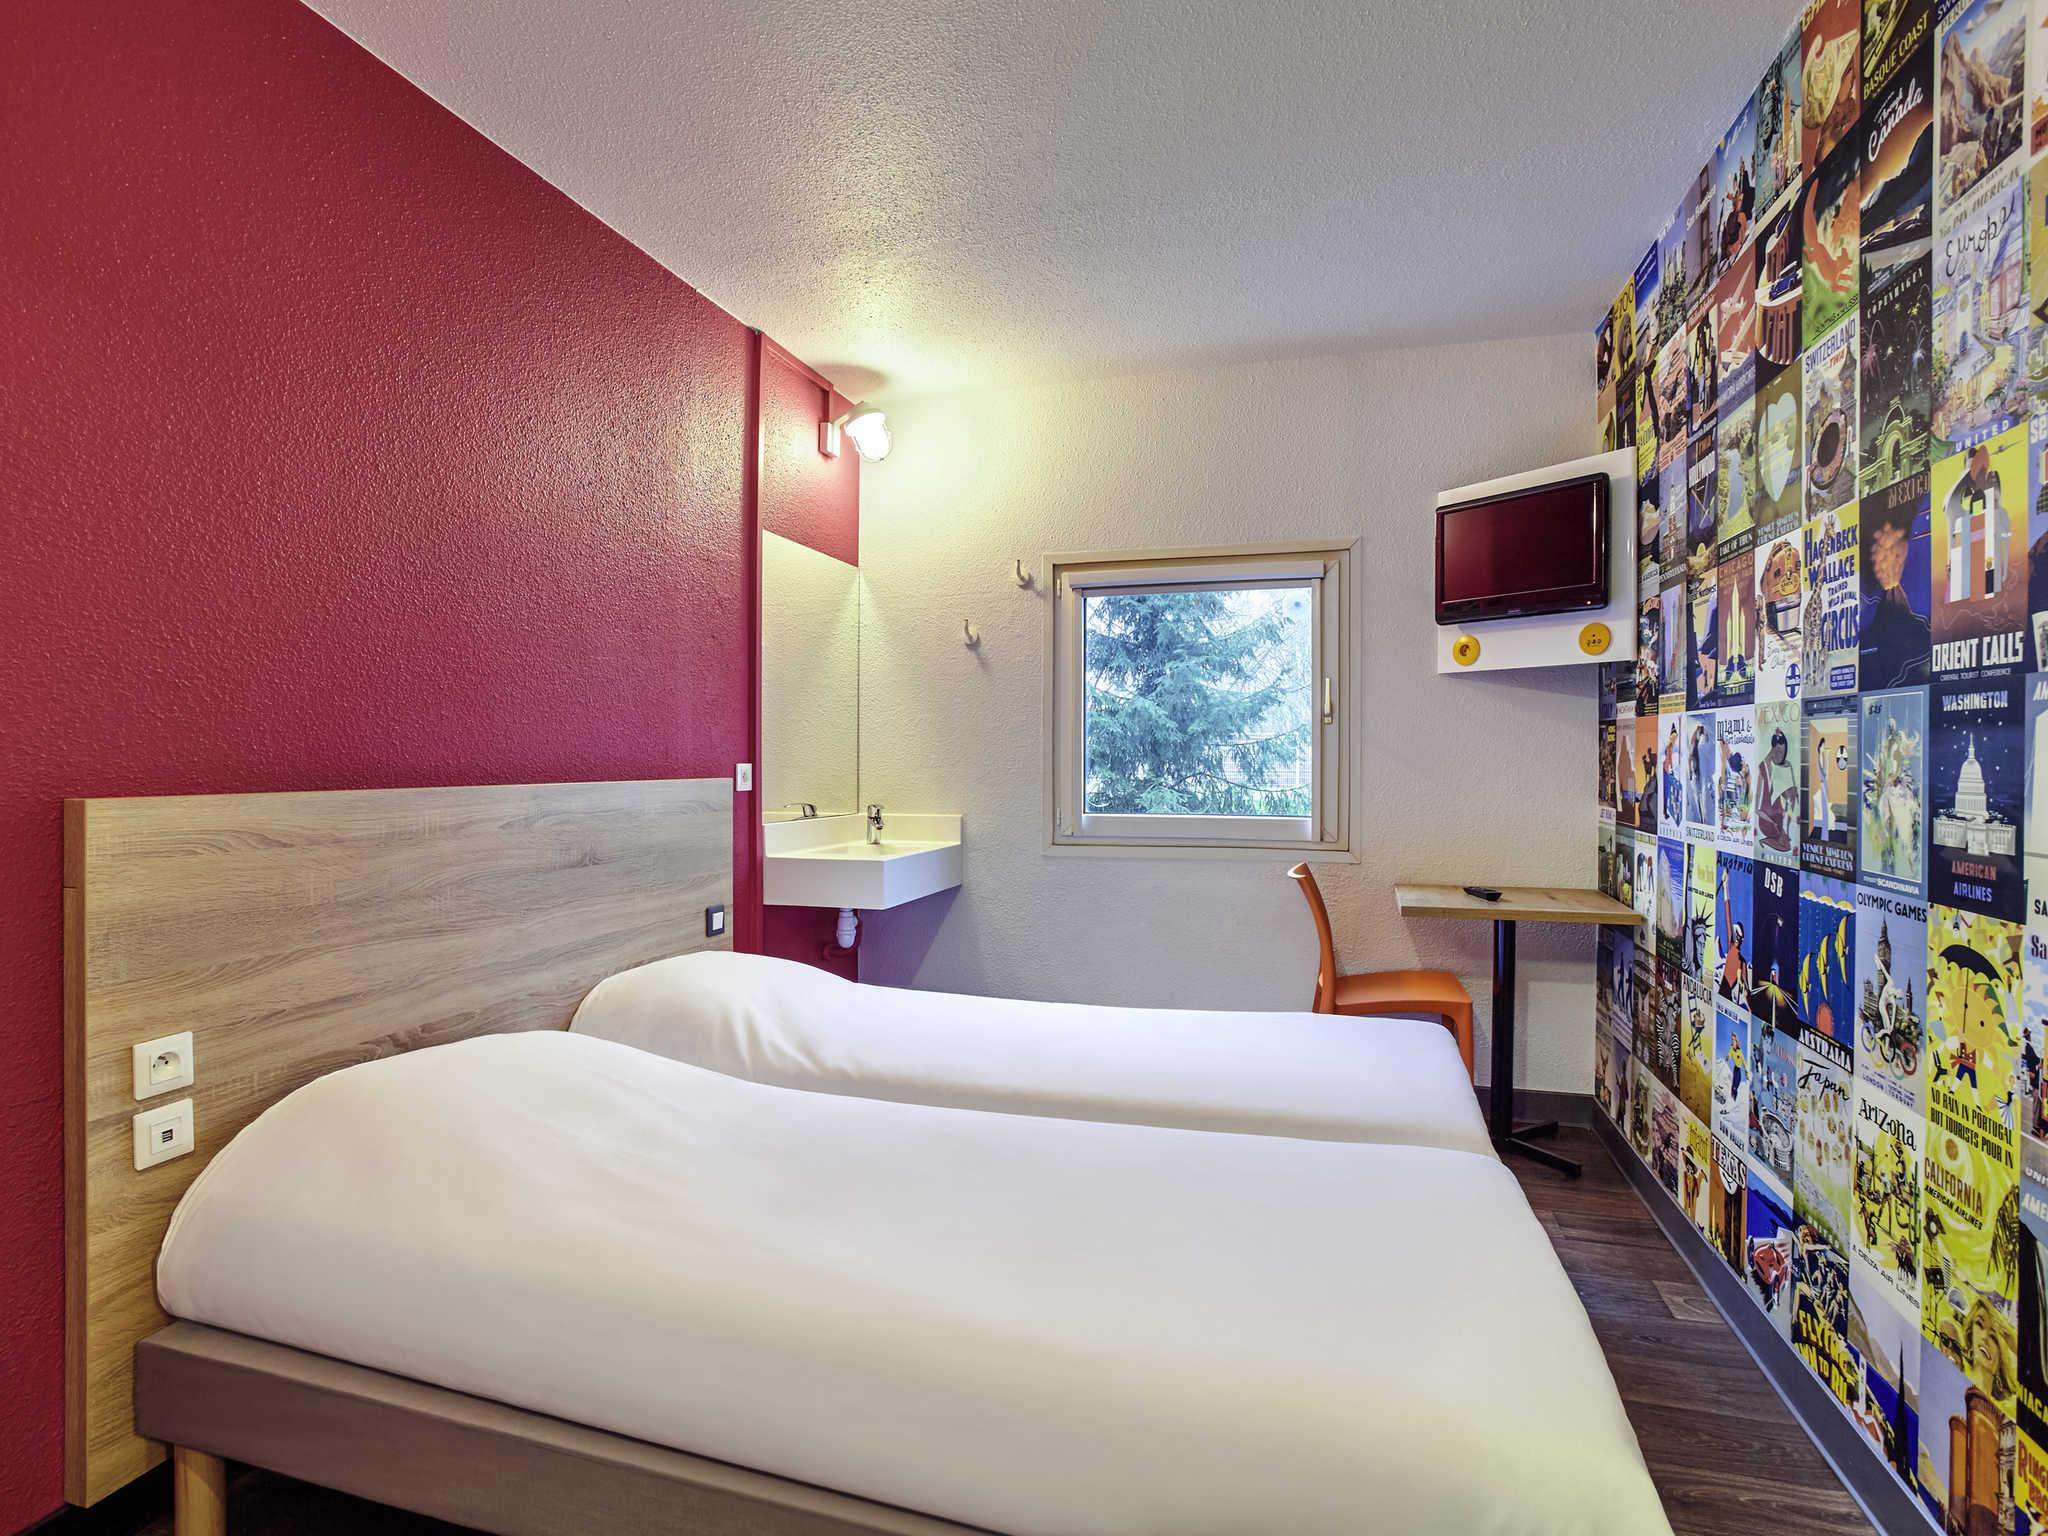 hotel in ennetieres en weppes hotelf1 lille englos. Black Bedroom Furniture Sets. Home Design Ideas